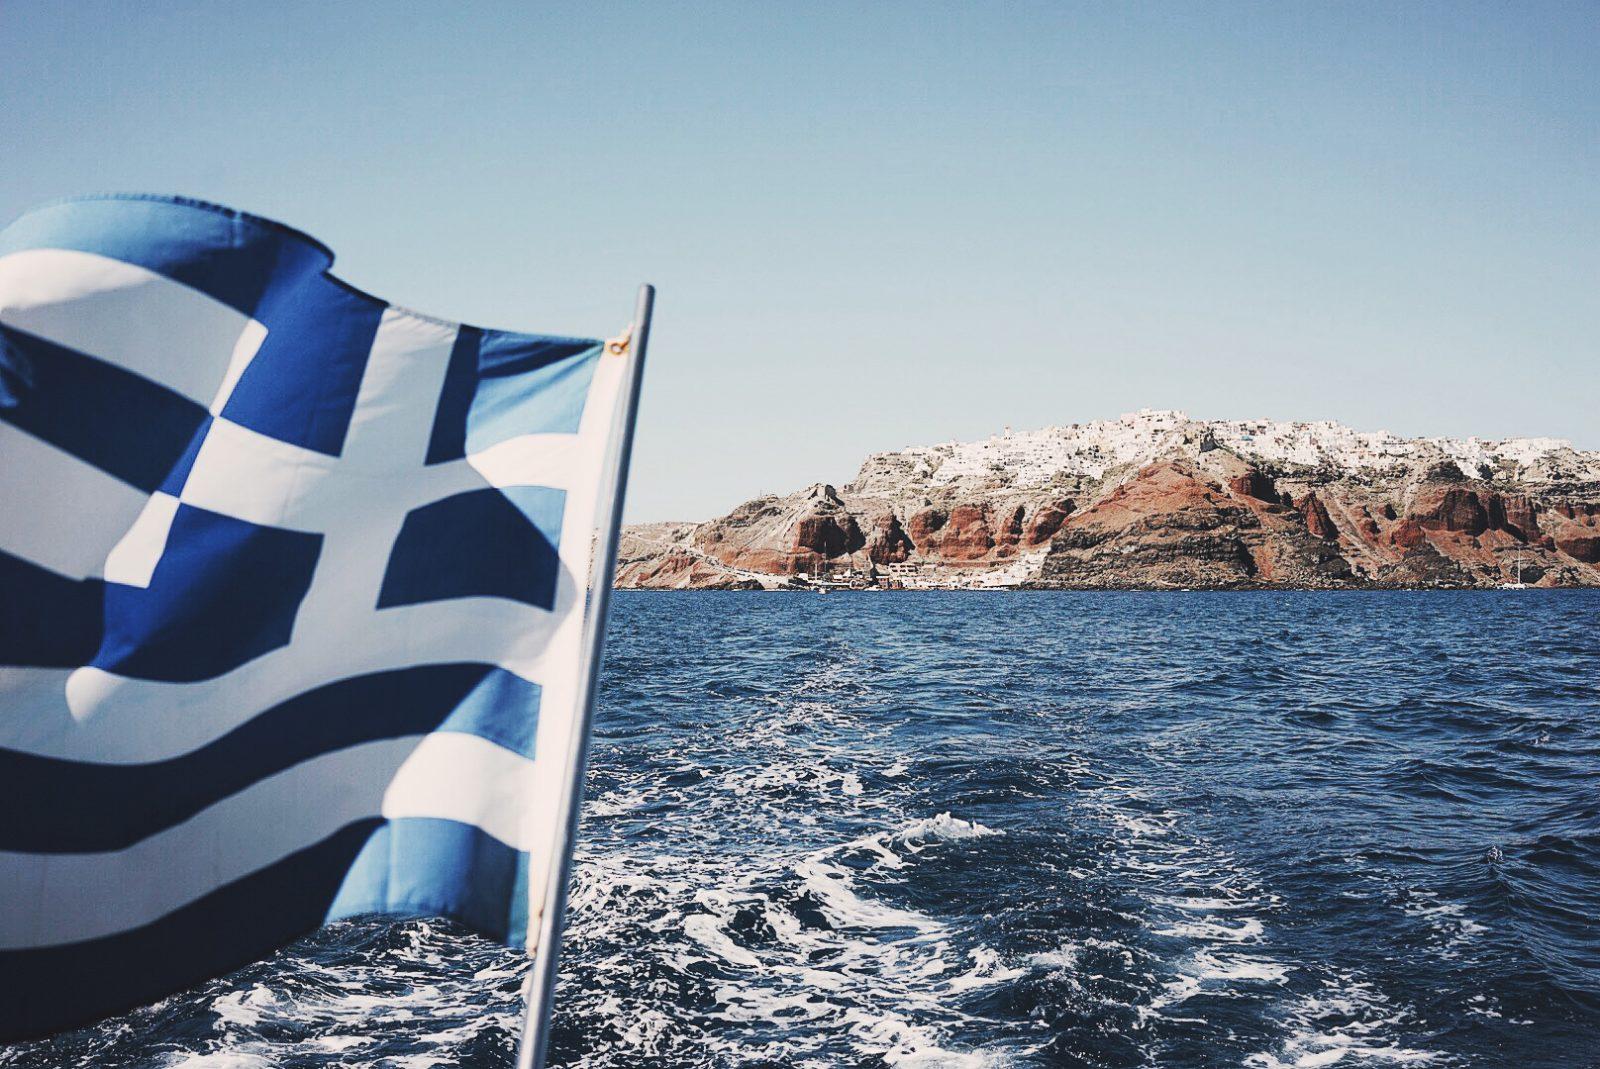 Soludos_Escapes-Boat_Trip-Bikini-Summer_Look-Santorini_Greece-GRLFRND_Jeans-Off_The_Shoulders-Collage_Vintage-Street_Style-Soludos_Espadrilles-27